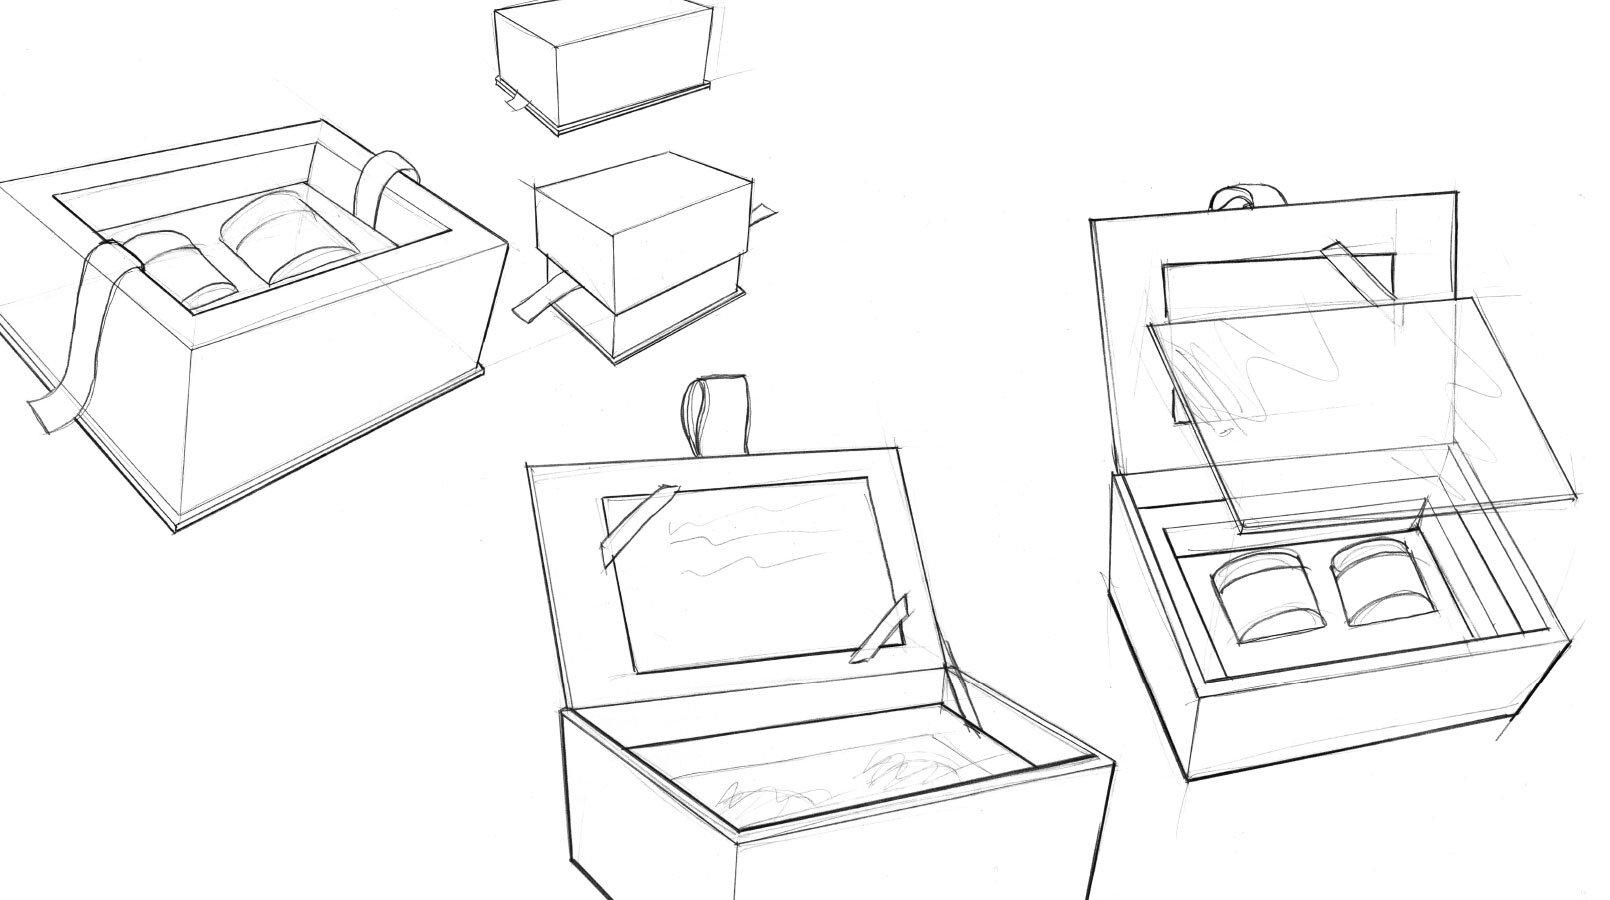 Nueverogena-Hydro-Boost-Box-Cometic包装公司 - 设计-2.jpg